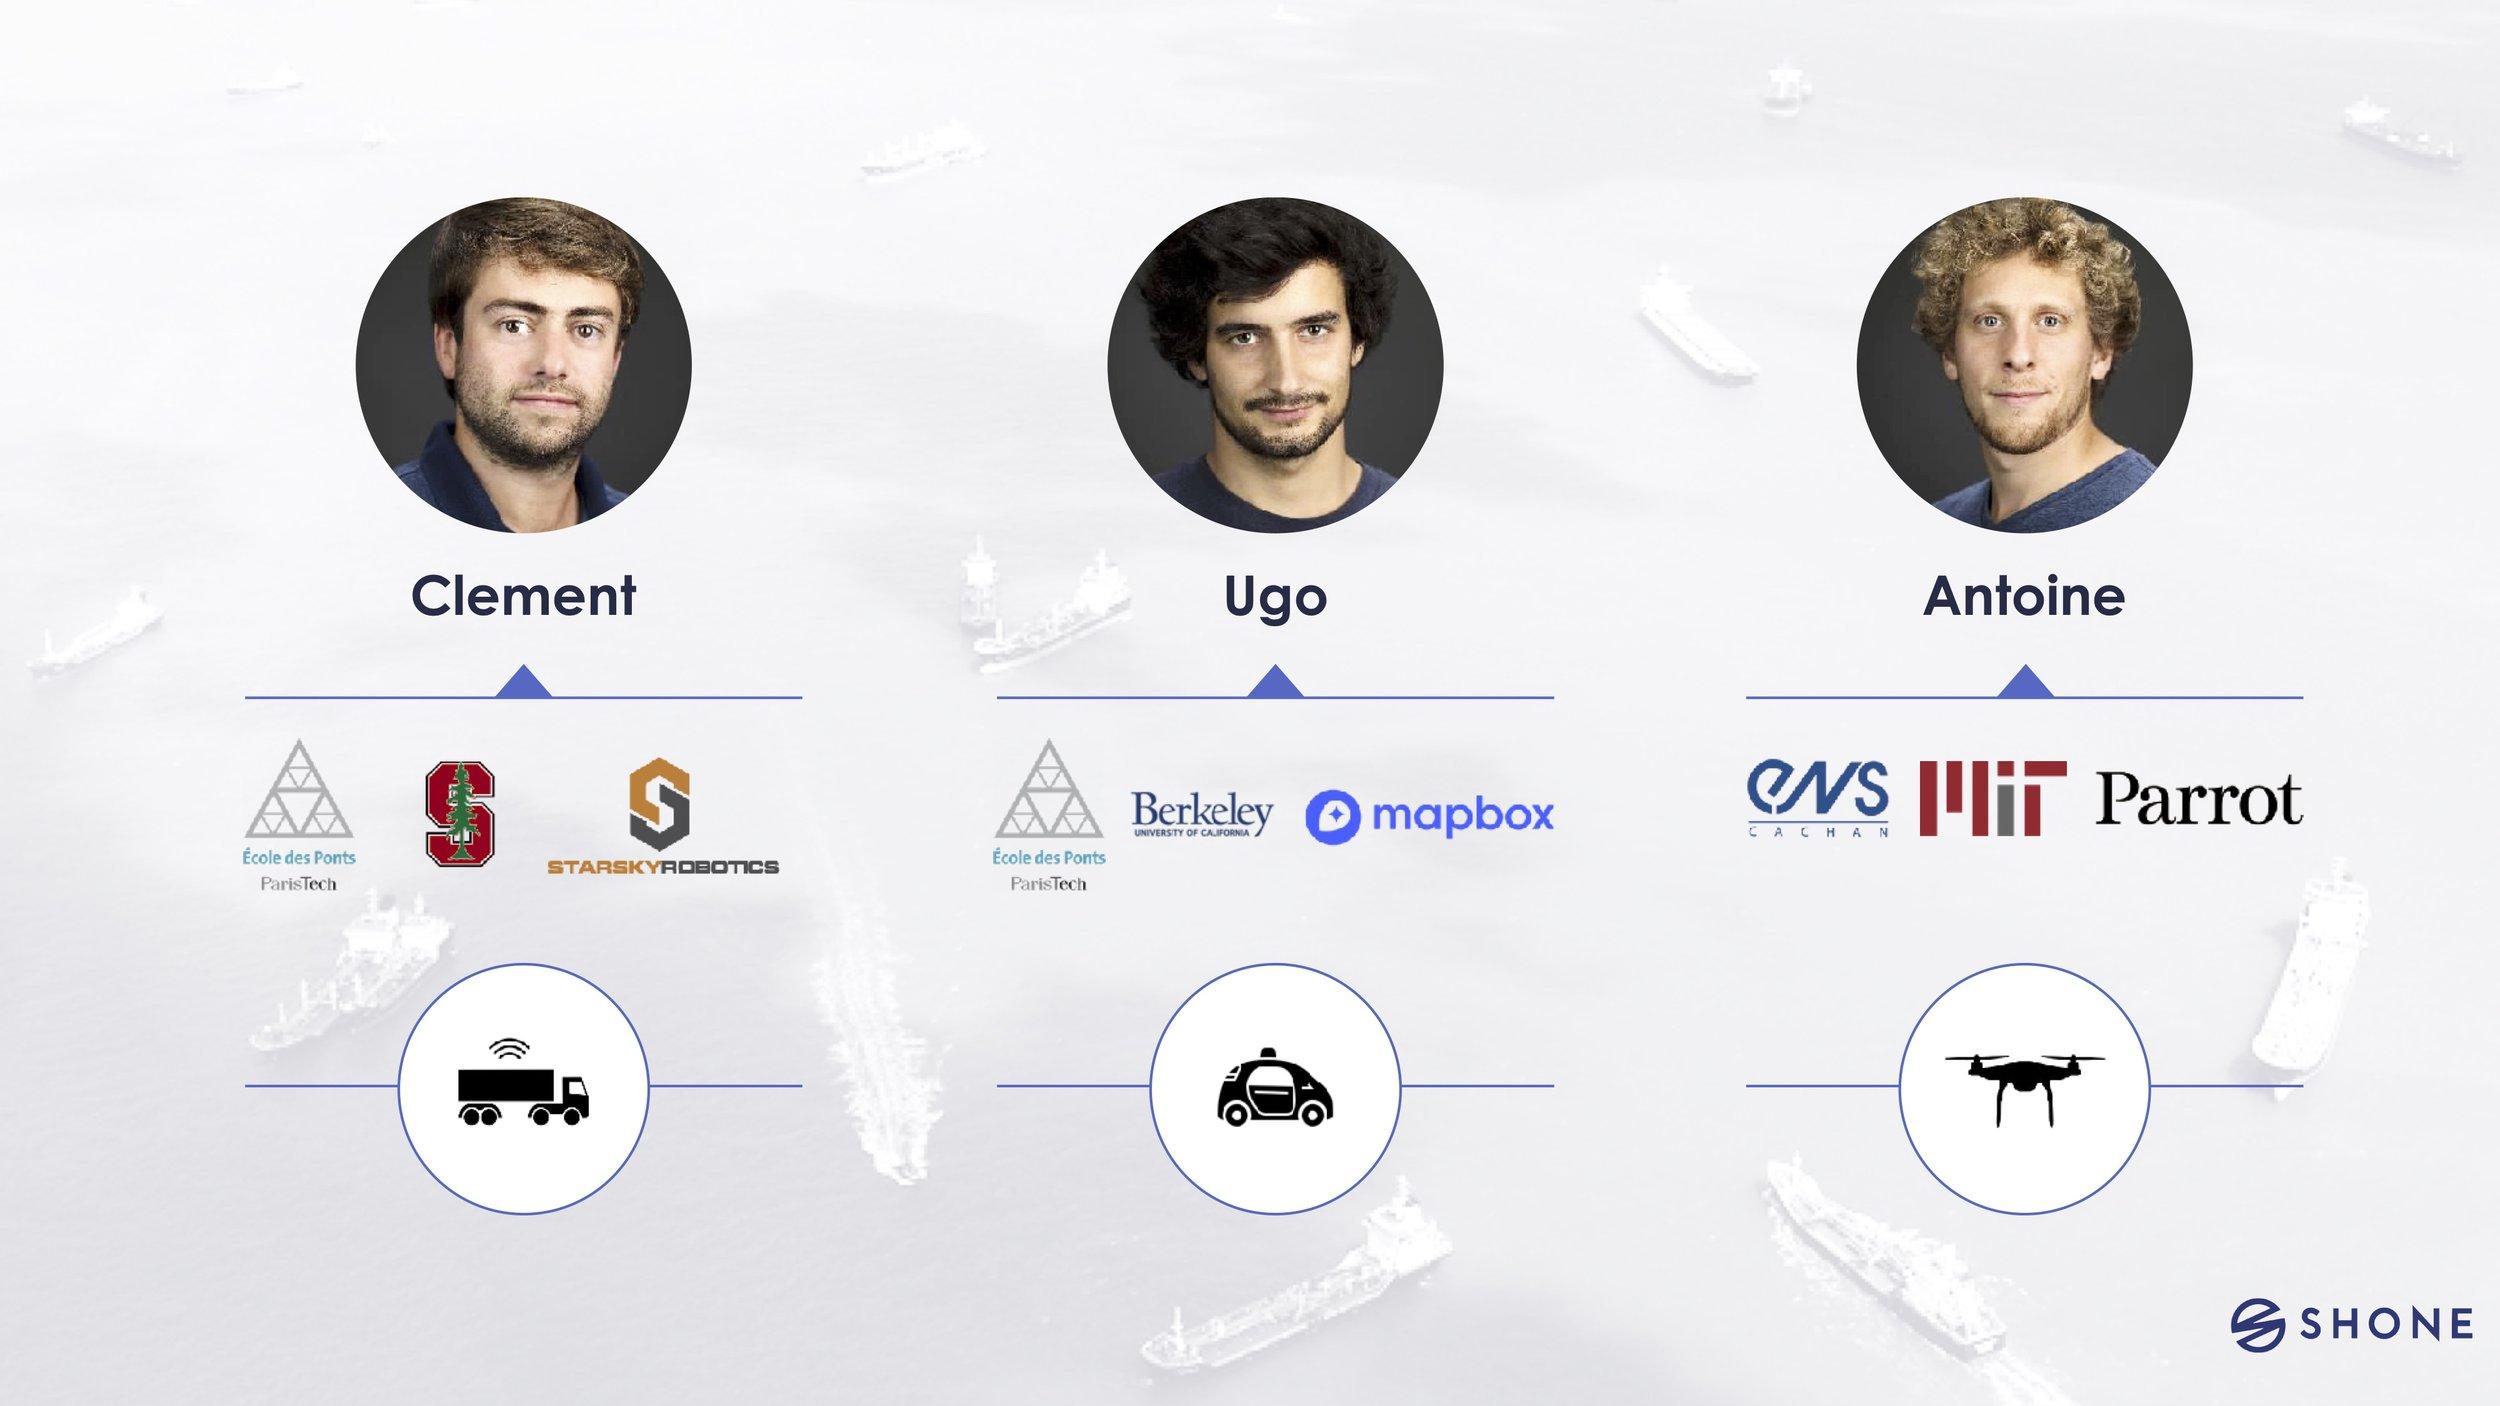 Co-founders of Shone: Clément Renault, Ugo Vollmer,Antoine De Maleprad